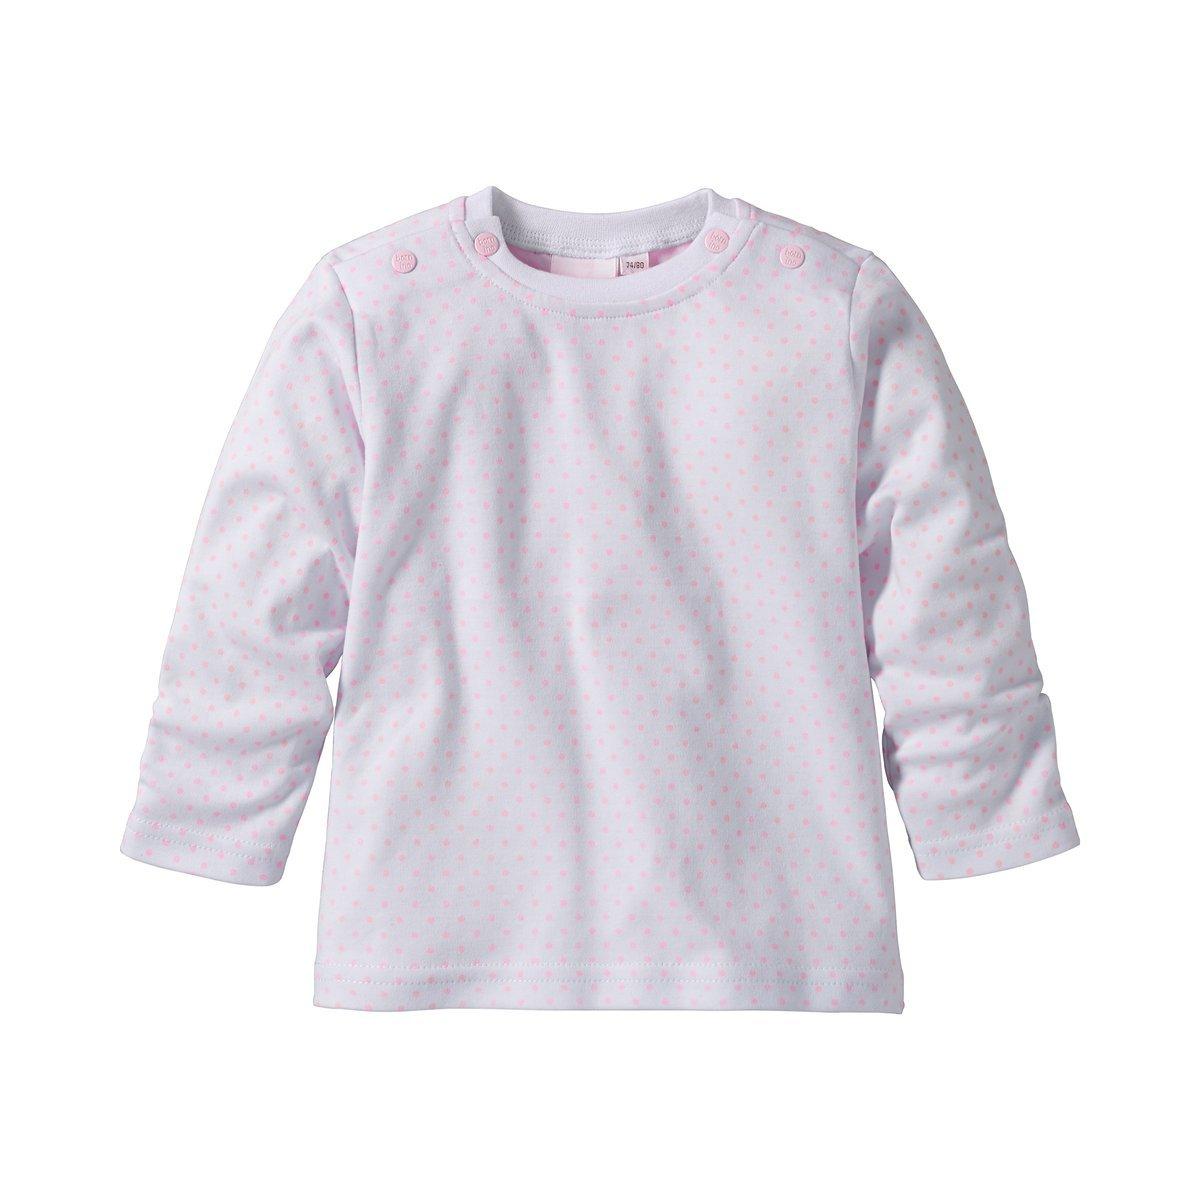 Bornino Langarmshirt 100/% Baumwolle mit Punkten wei/ß//ros/é M/ädchen